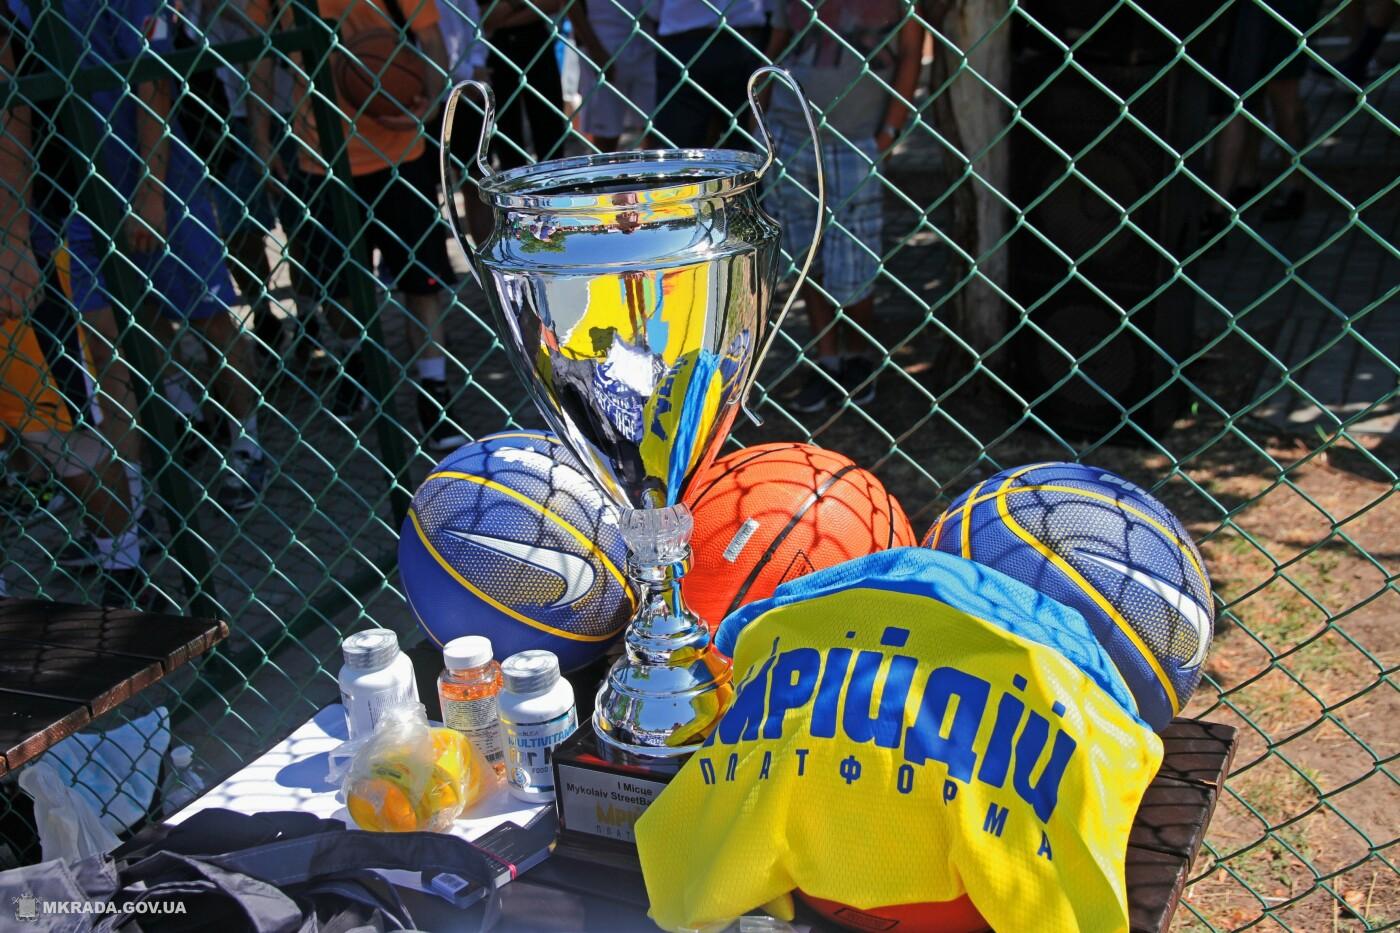 Команда «МрийДий» представила первую в Украине баскетбольную площадку в стиле street art, - ФОТО, фото-5